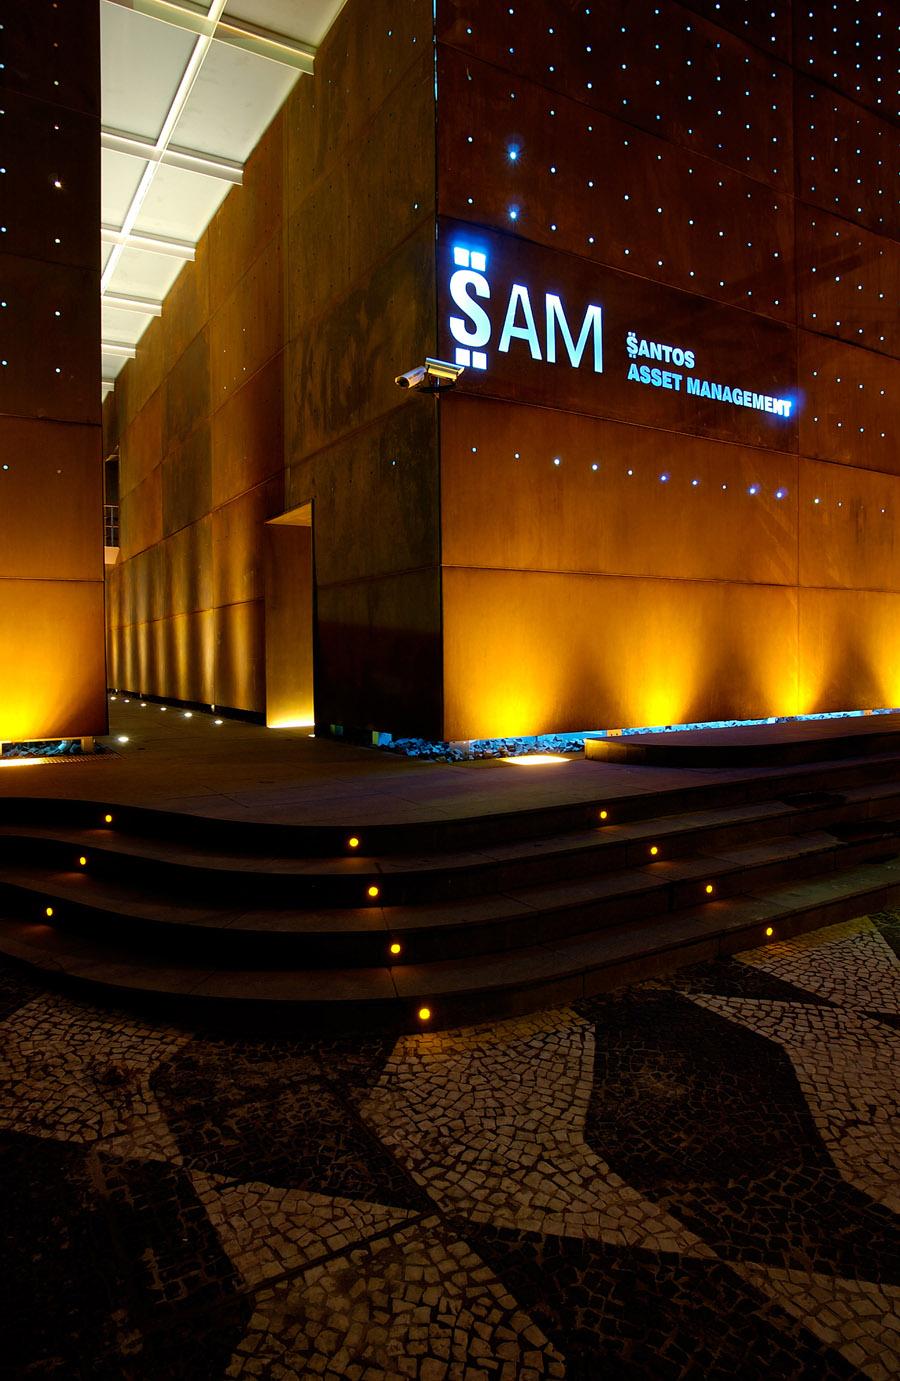 Santos Asset Management